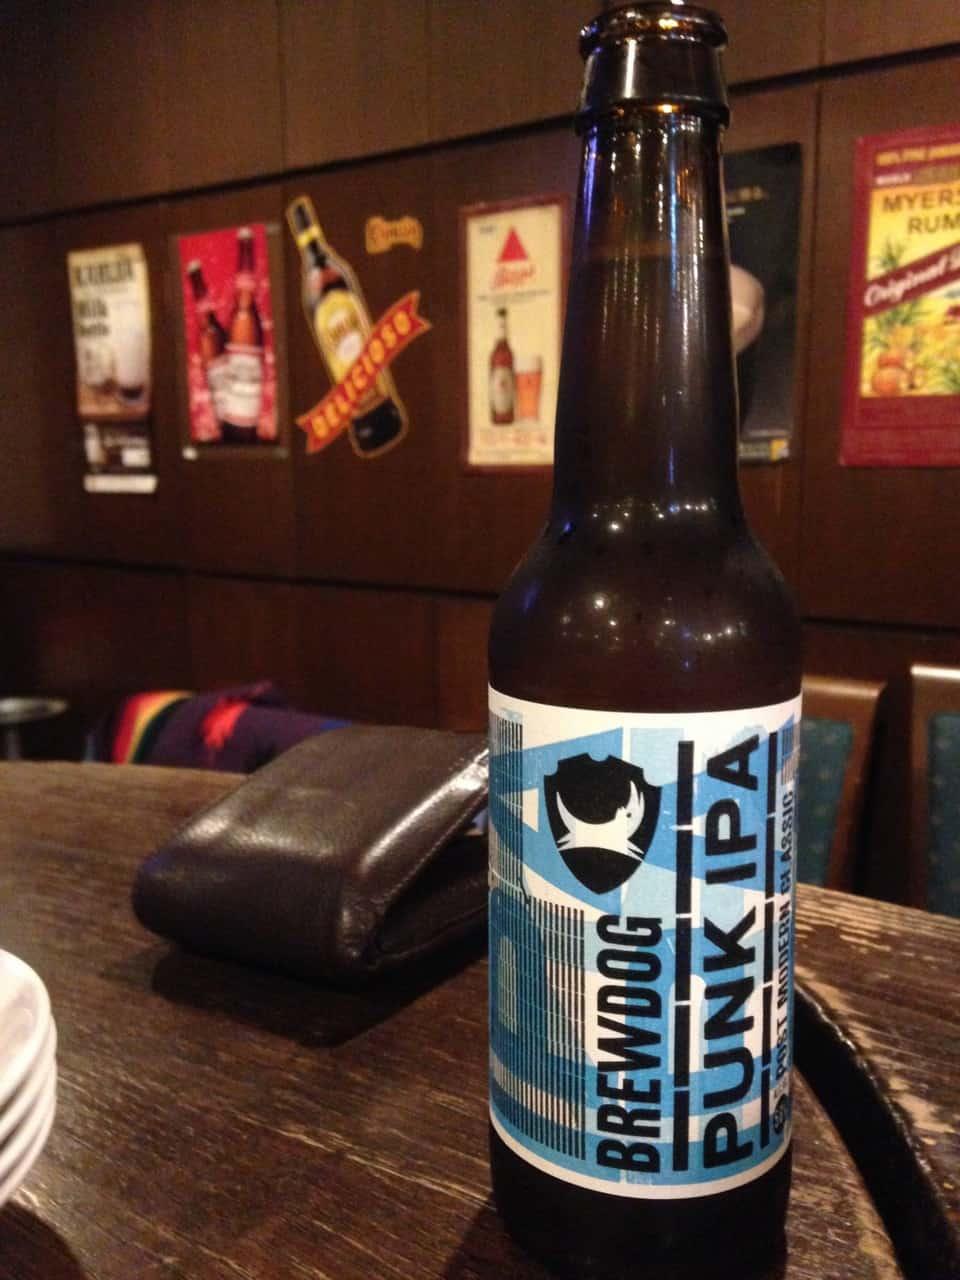 Sundance: Tex Mex and Irish Pub in Morioka, Iwate